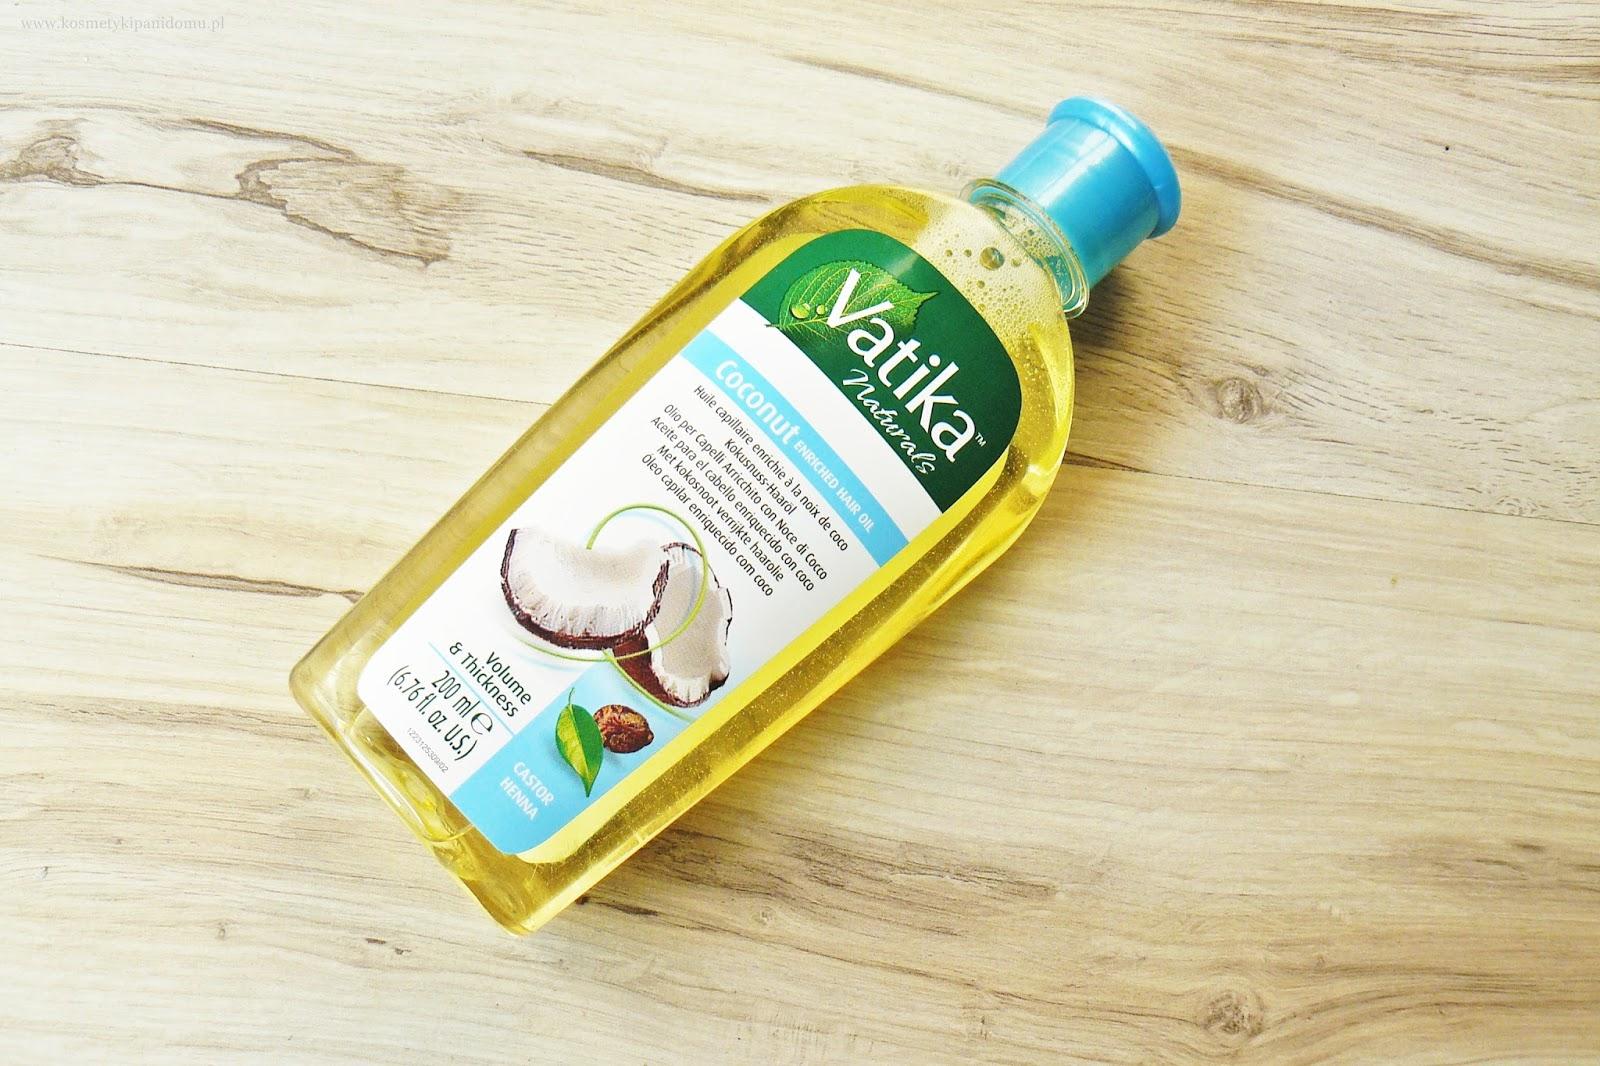 COCONUT HAIR OIL. I JAK?